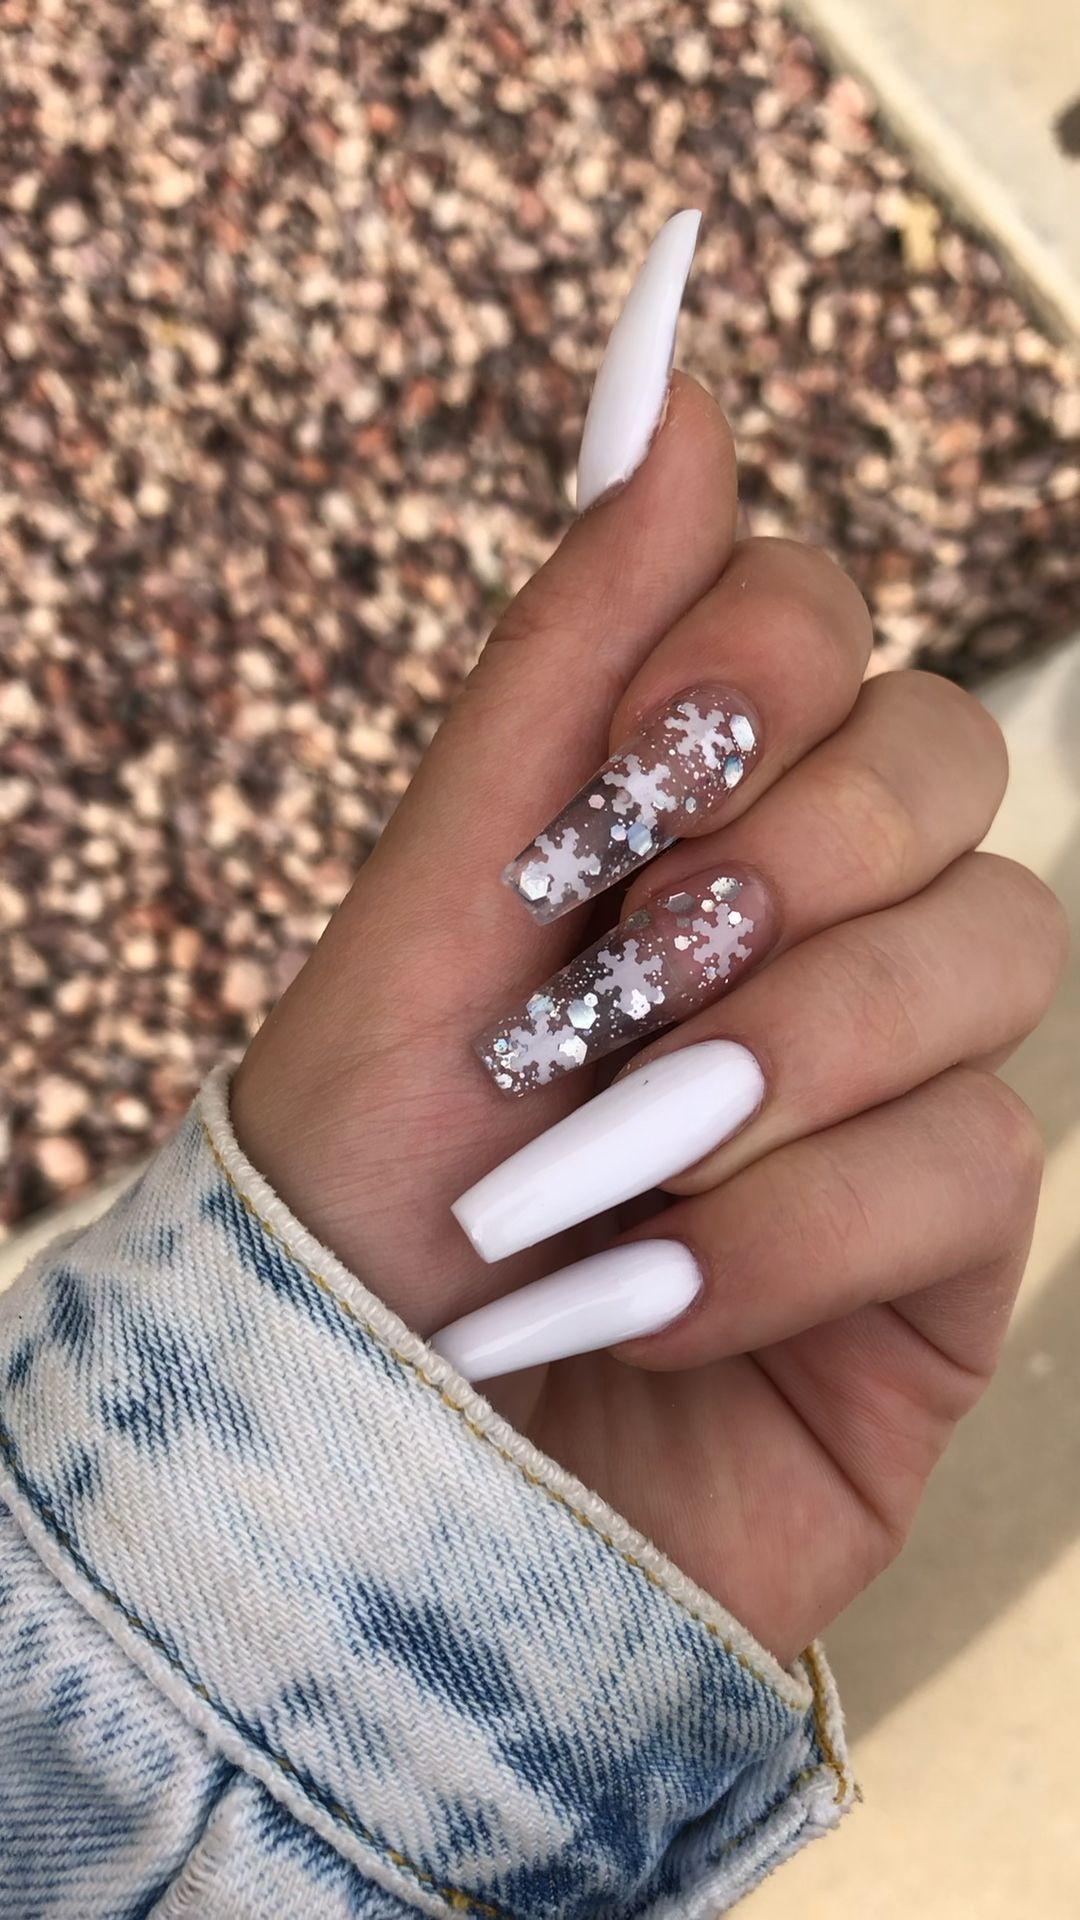 Long Winter Acrylic Nails Acrylic Long Nails Winter In 2020 Cute Acrylic Nail Designs Winter Nails Acrylic Best Acrylic Nails